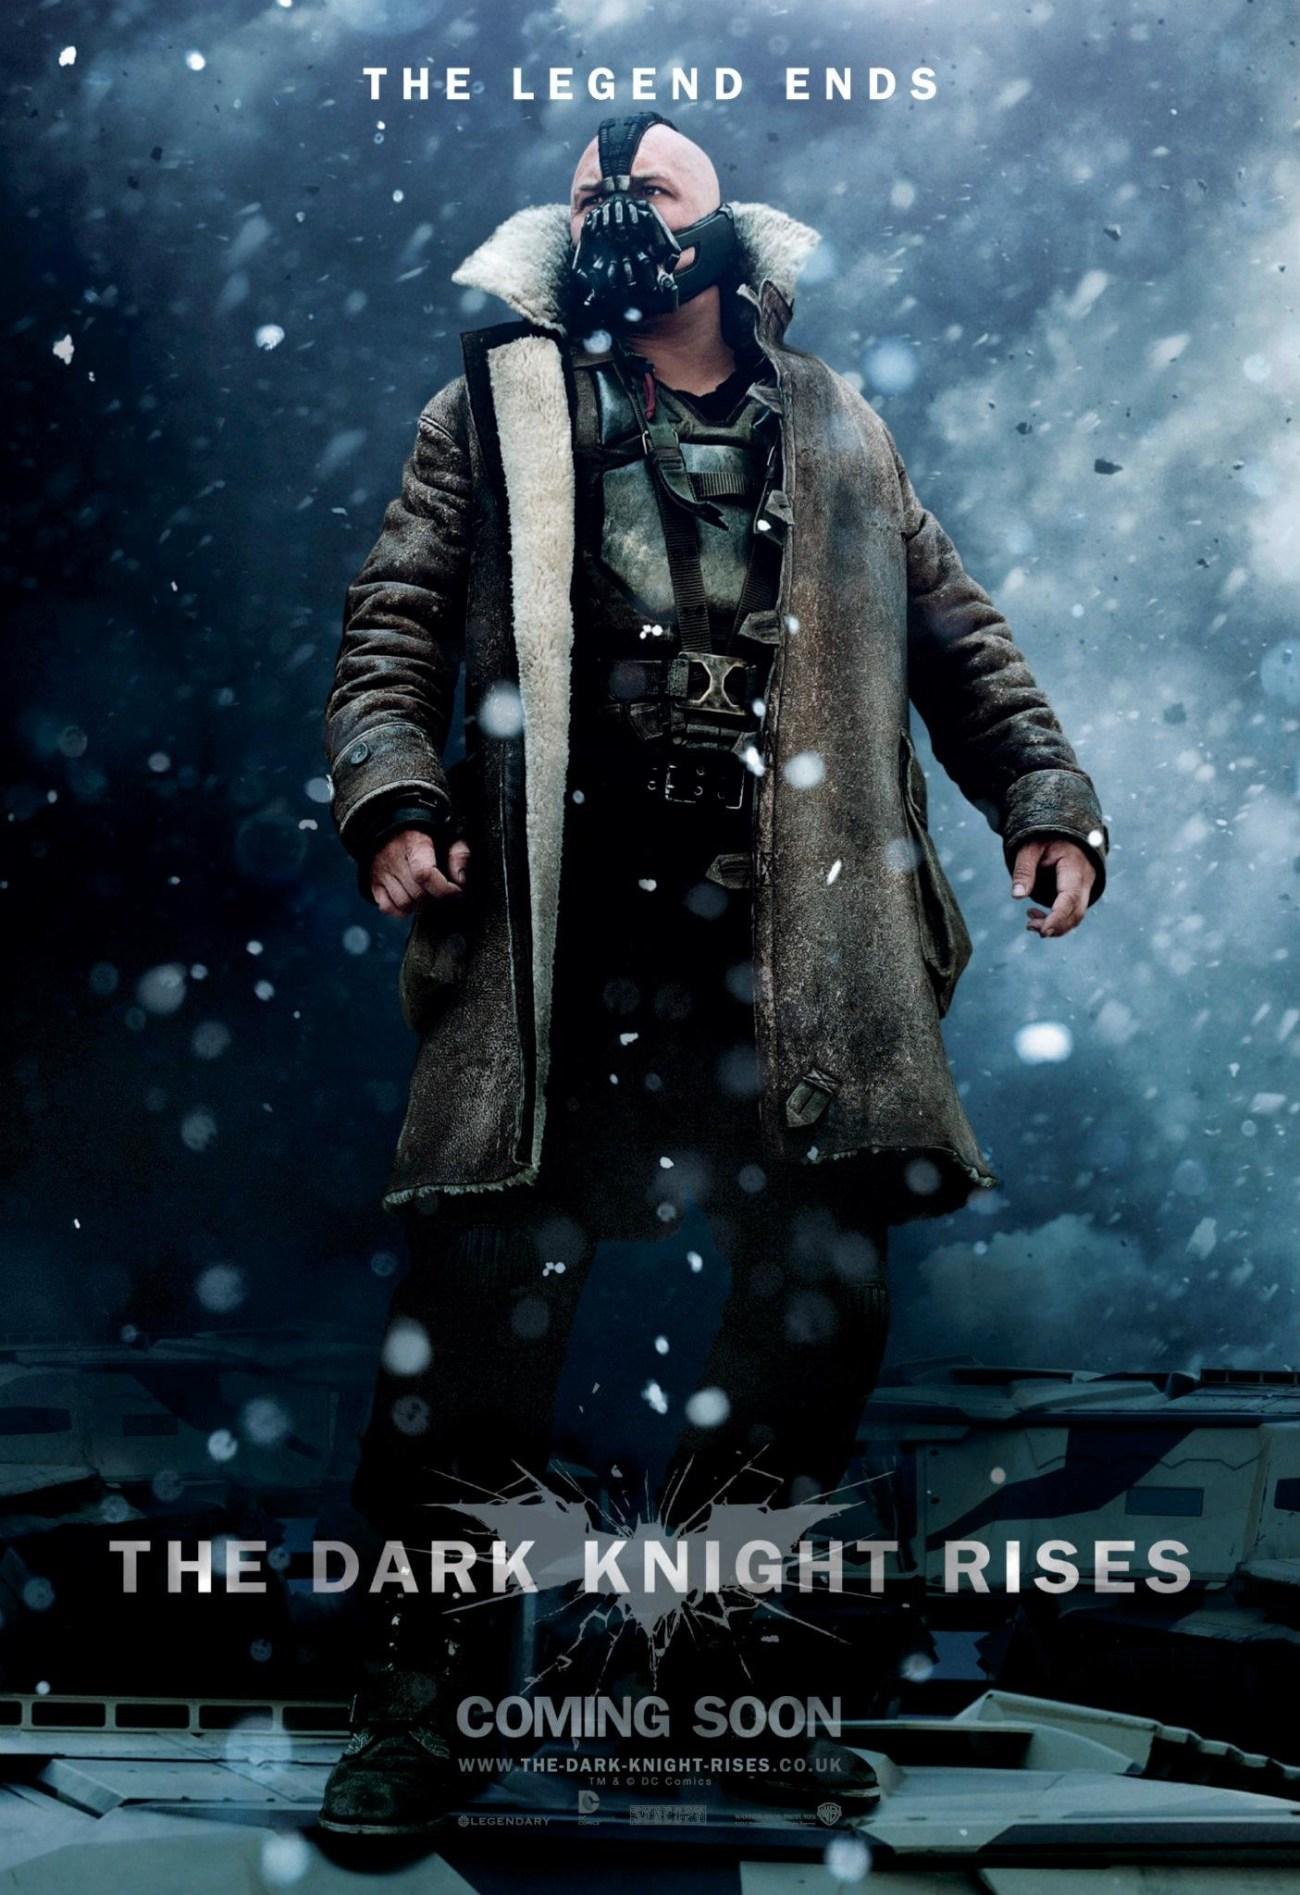 Tom Hardy como Bane en un póster promocional de The Dark Knight Rises (2012). Imagen: impawards.com